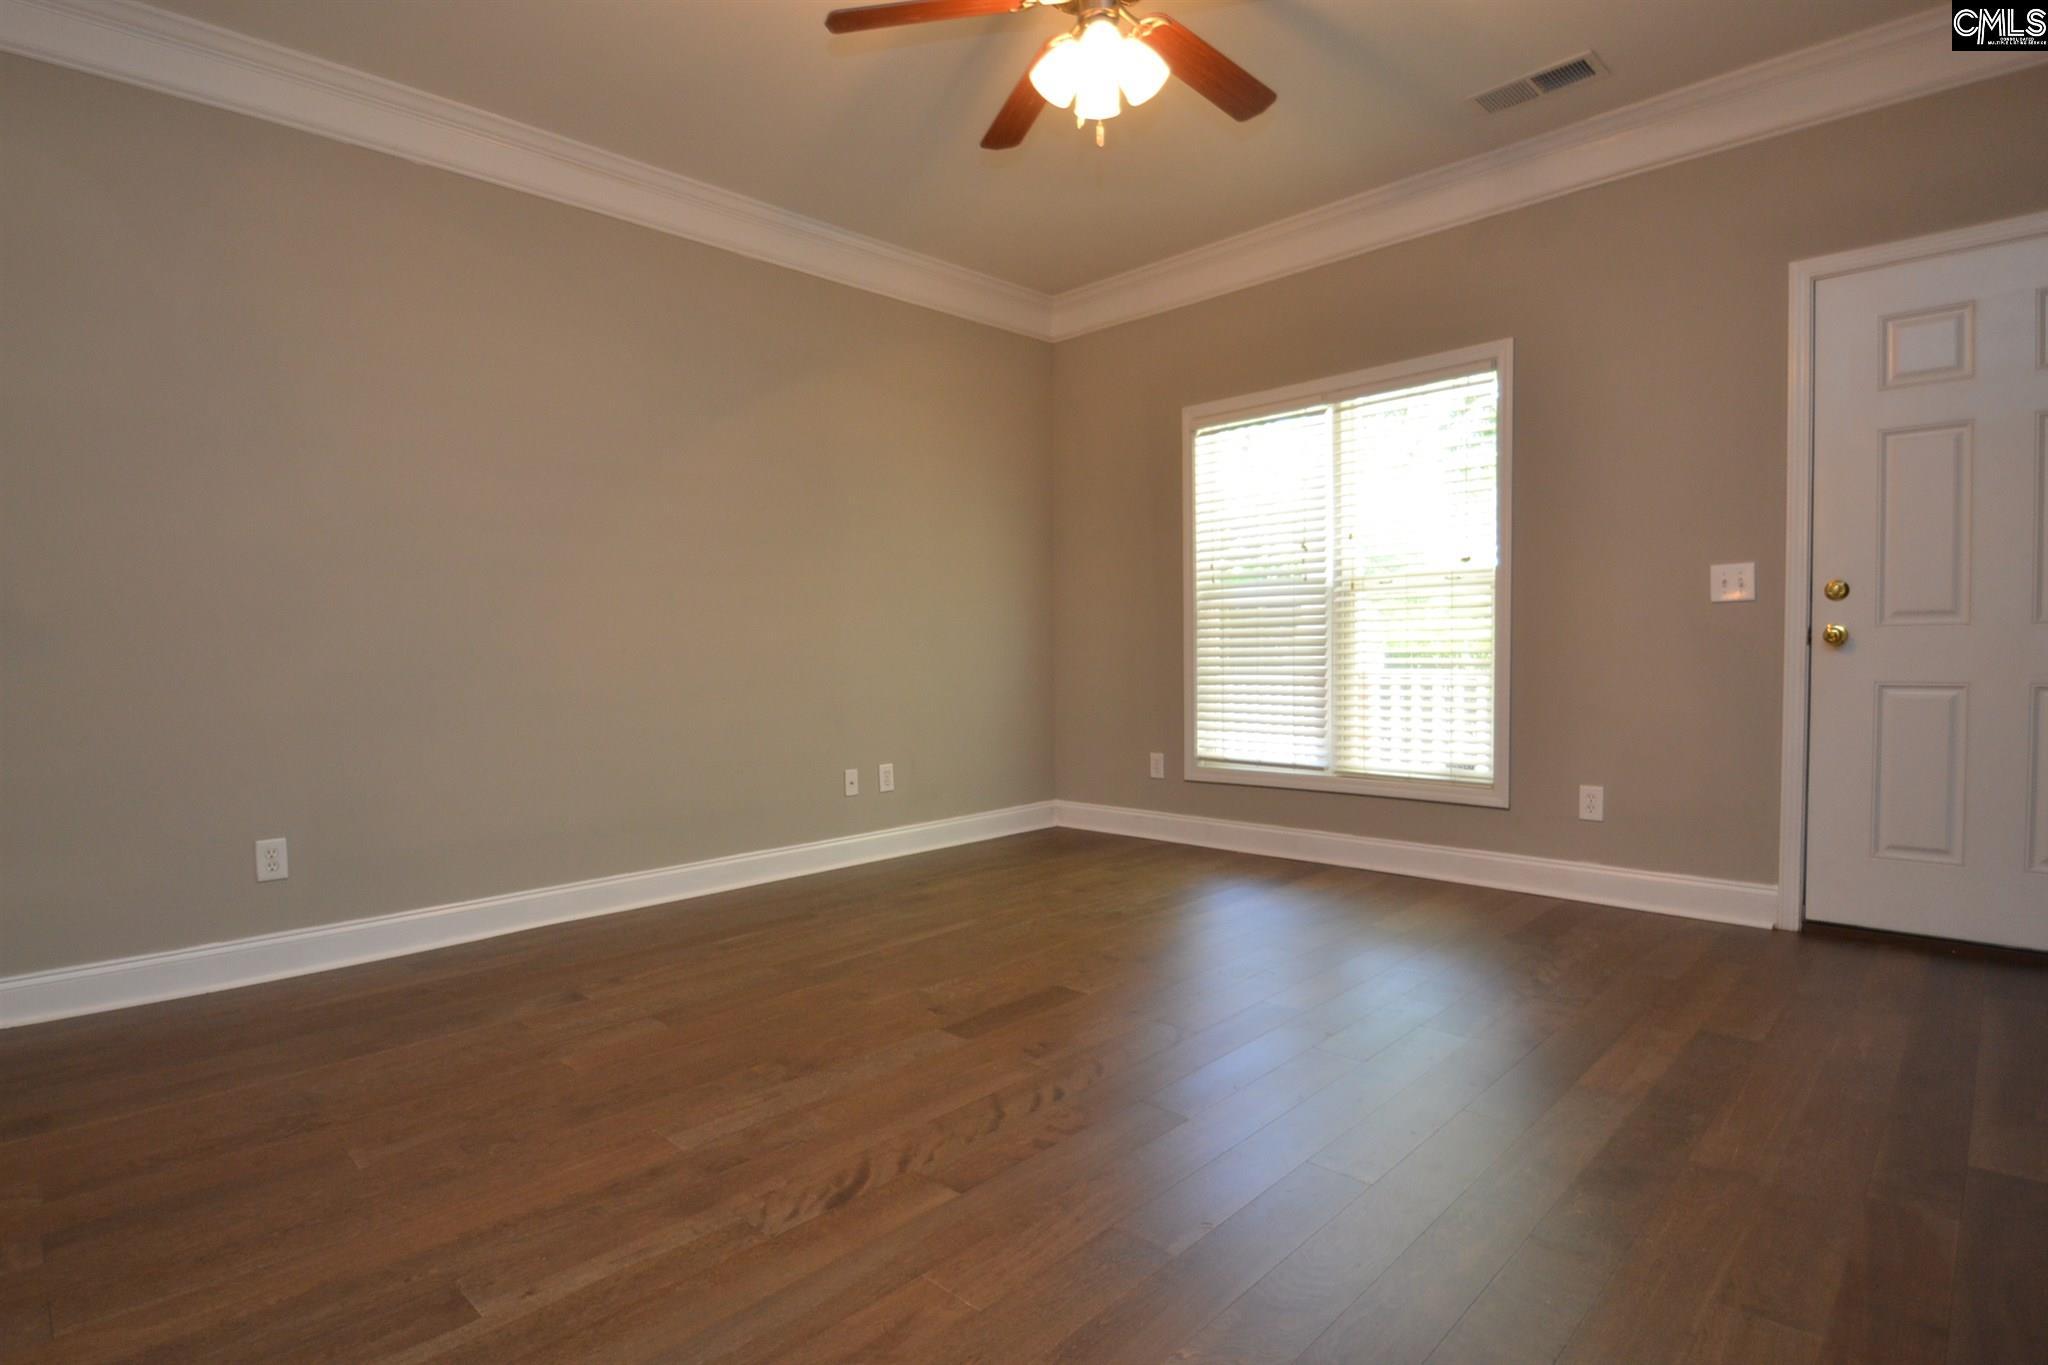 MLS 206 Hampton Forest Columbia South Carolina for $123 900